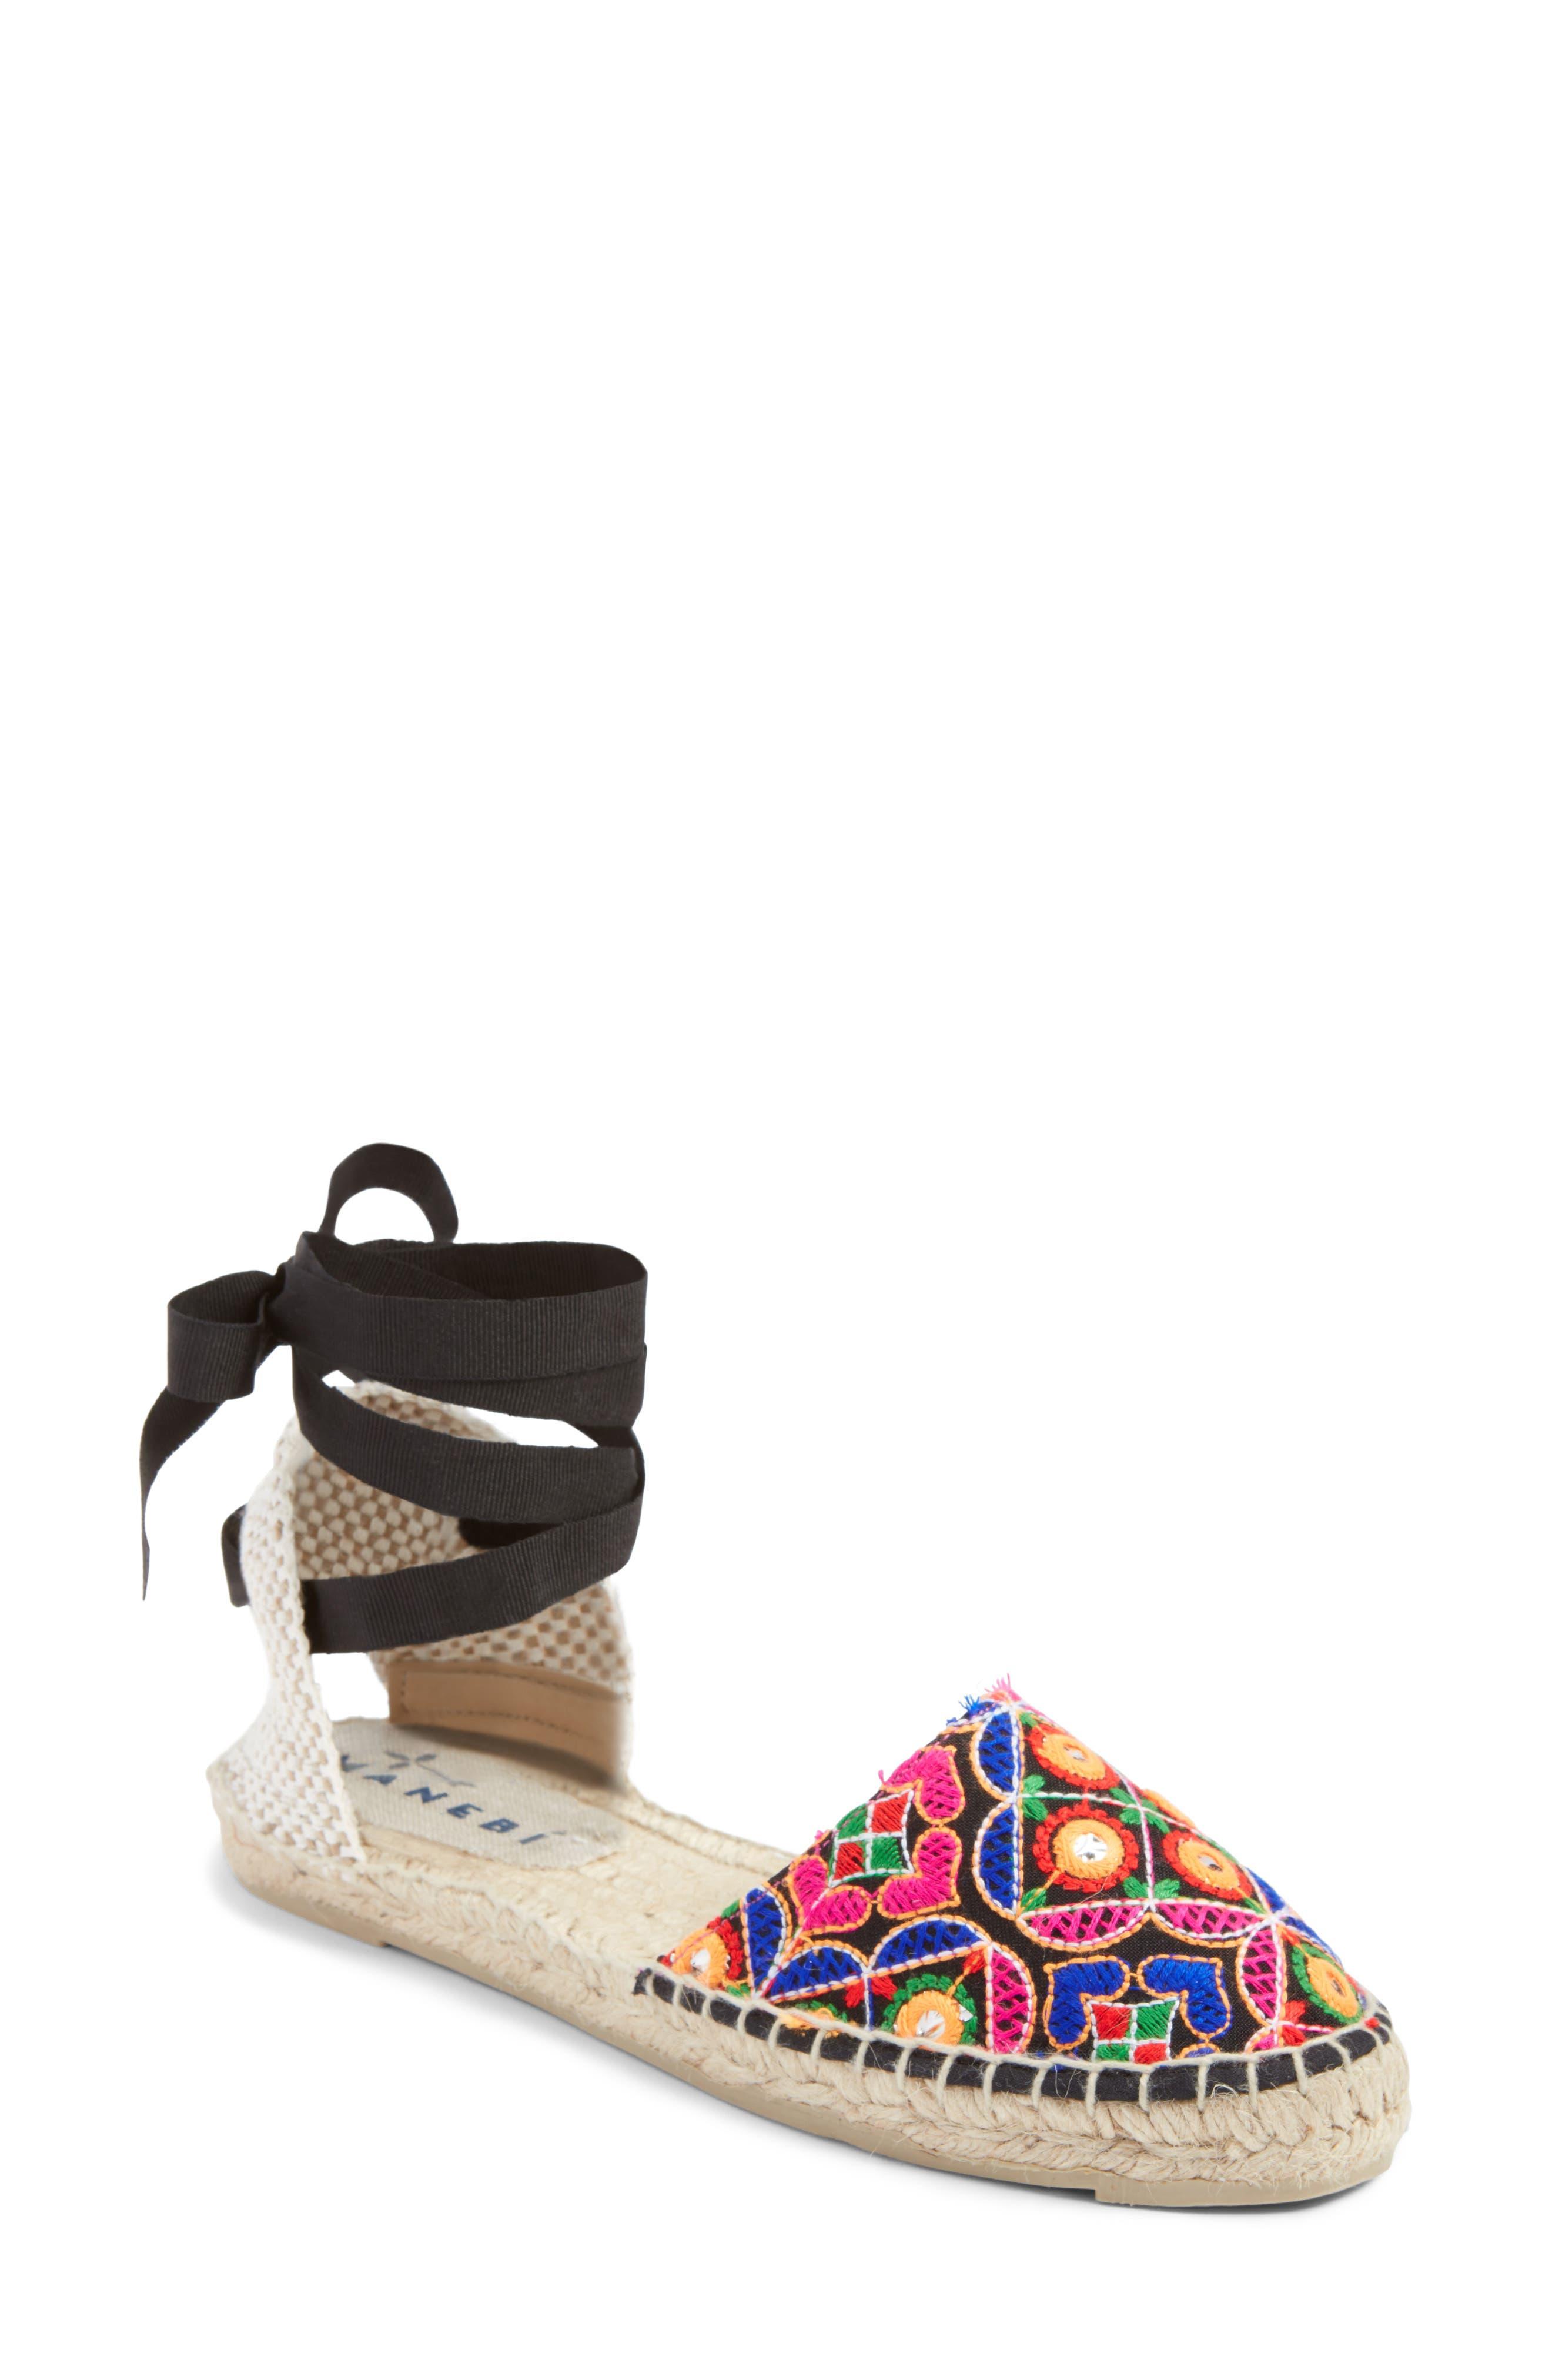 MANEBÍ Rajasthan Espadrille Sandal,                         Main,                         color, Indian Fabric